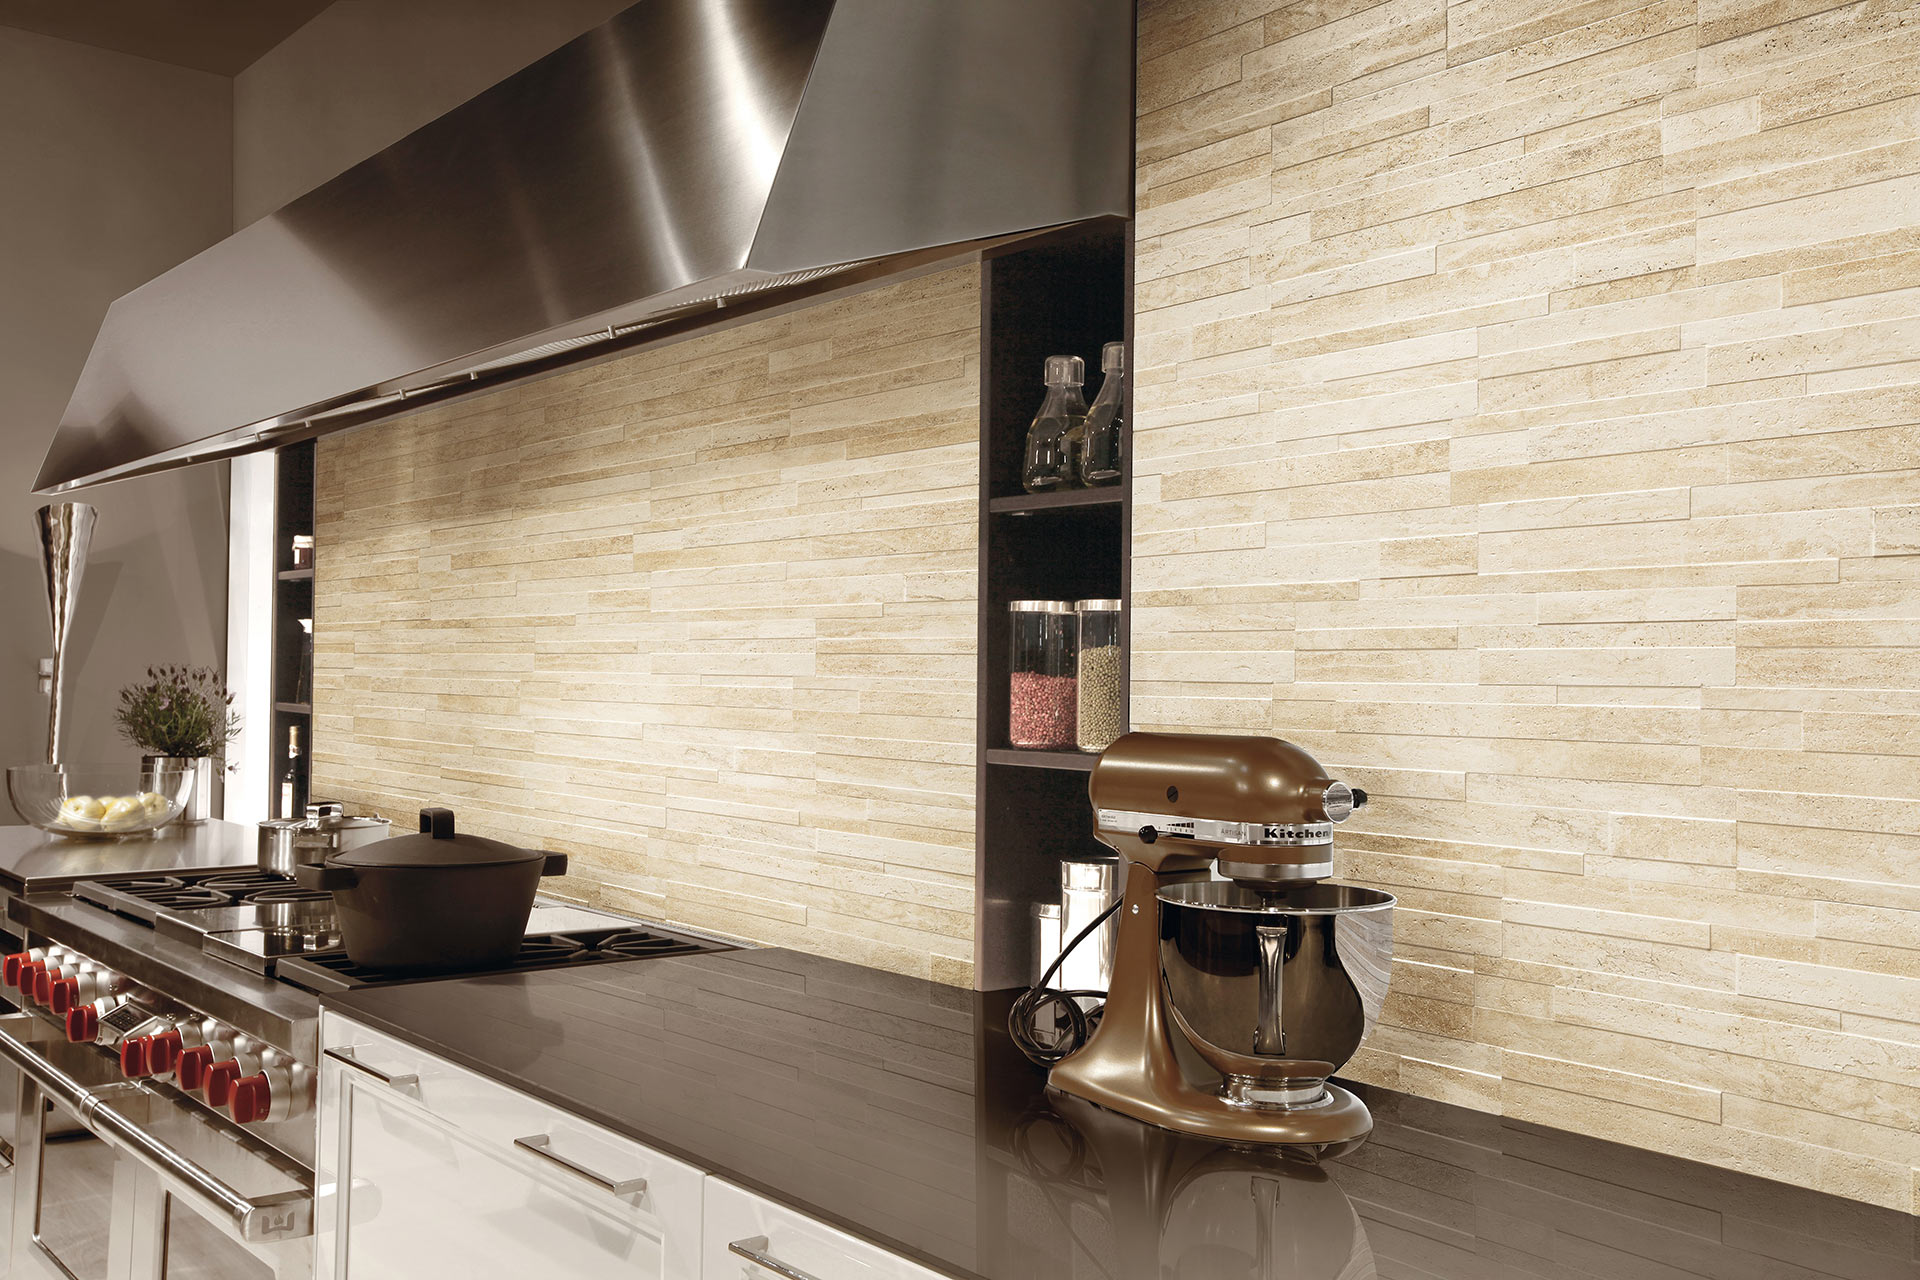 Penrith Tiles, Flooring & Bathrooms - Emu Plains, NSW - Tiles